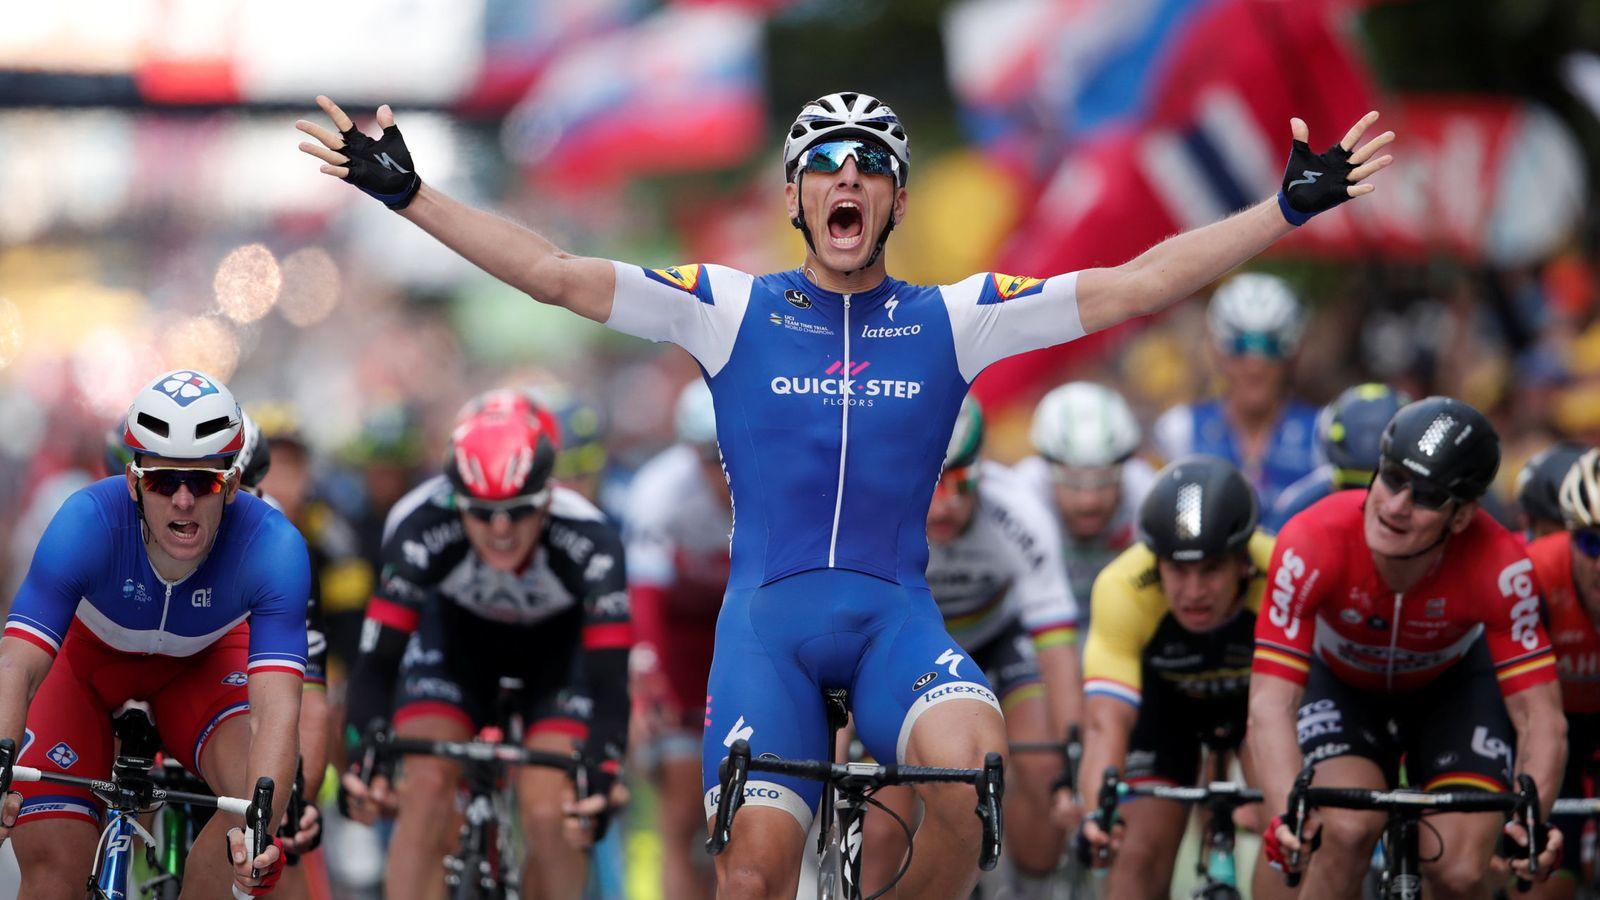 Foto: Kittel estrenó los sprints del Tour. (Reuters)